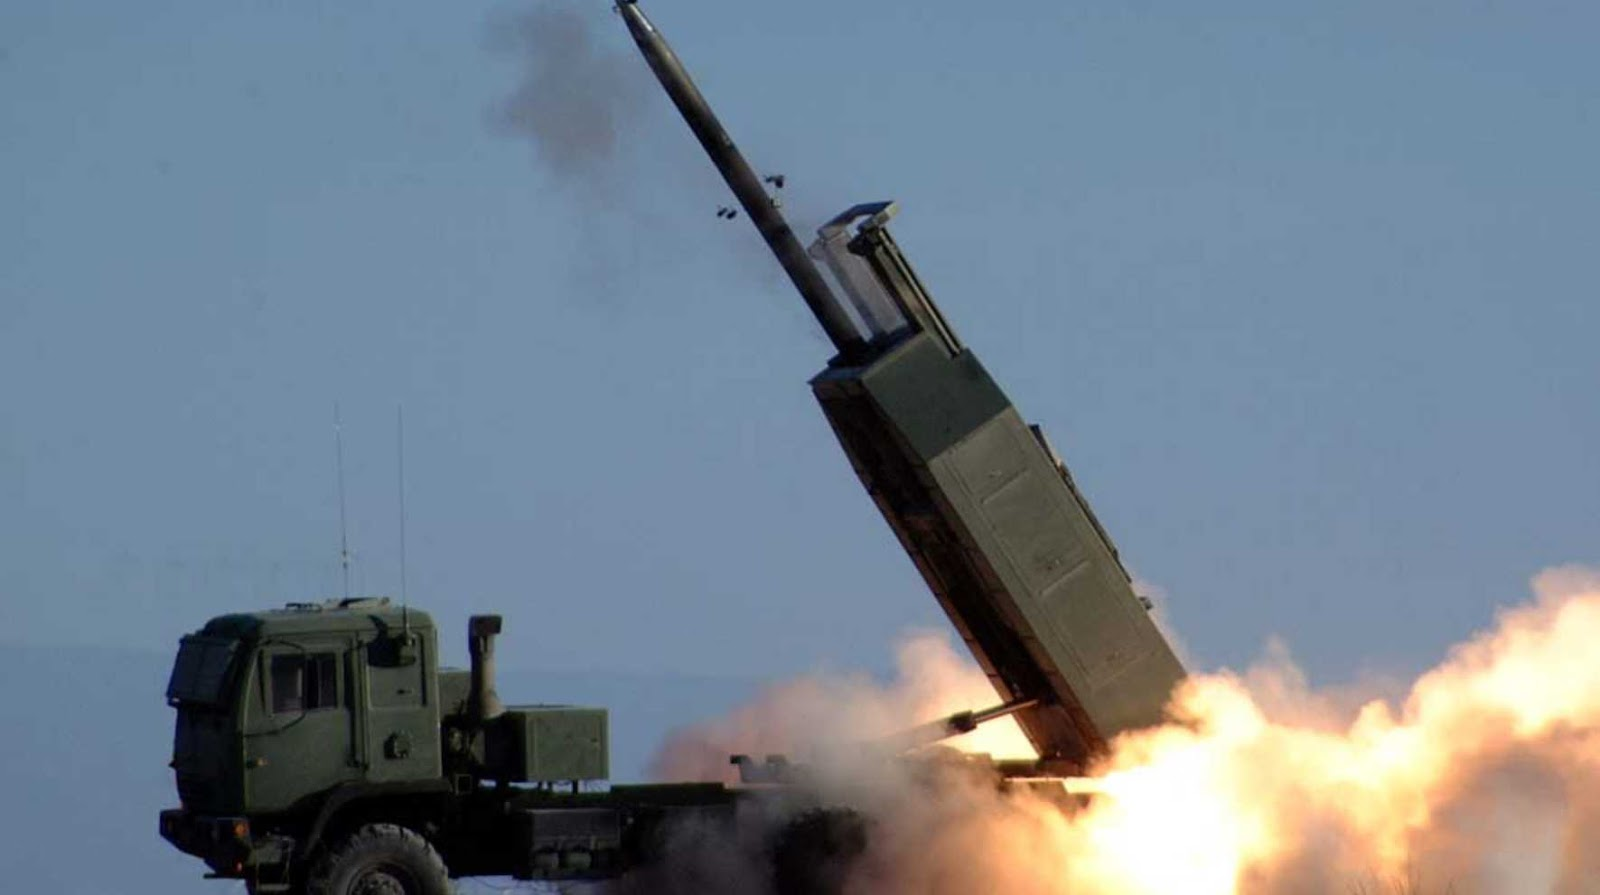 Amerika Serikat akan memasok Polandia dengan 20 sistem roket peluncuran ganda seharga $ 655 juta